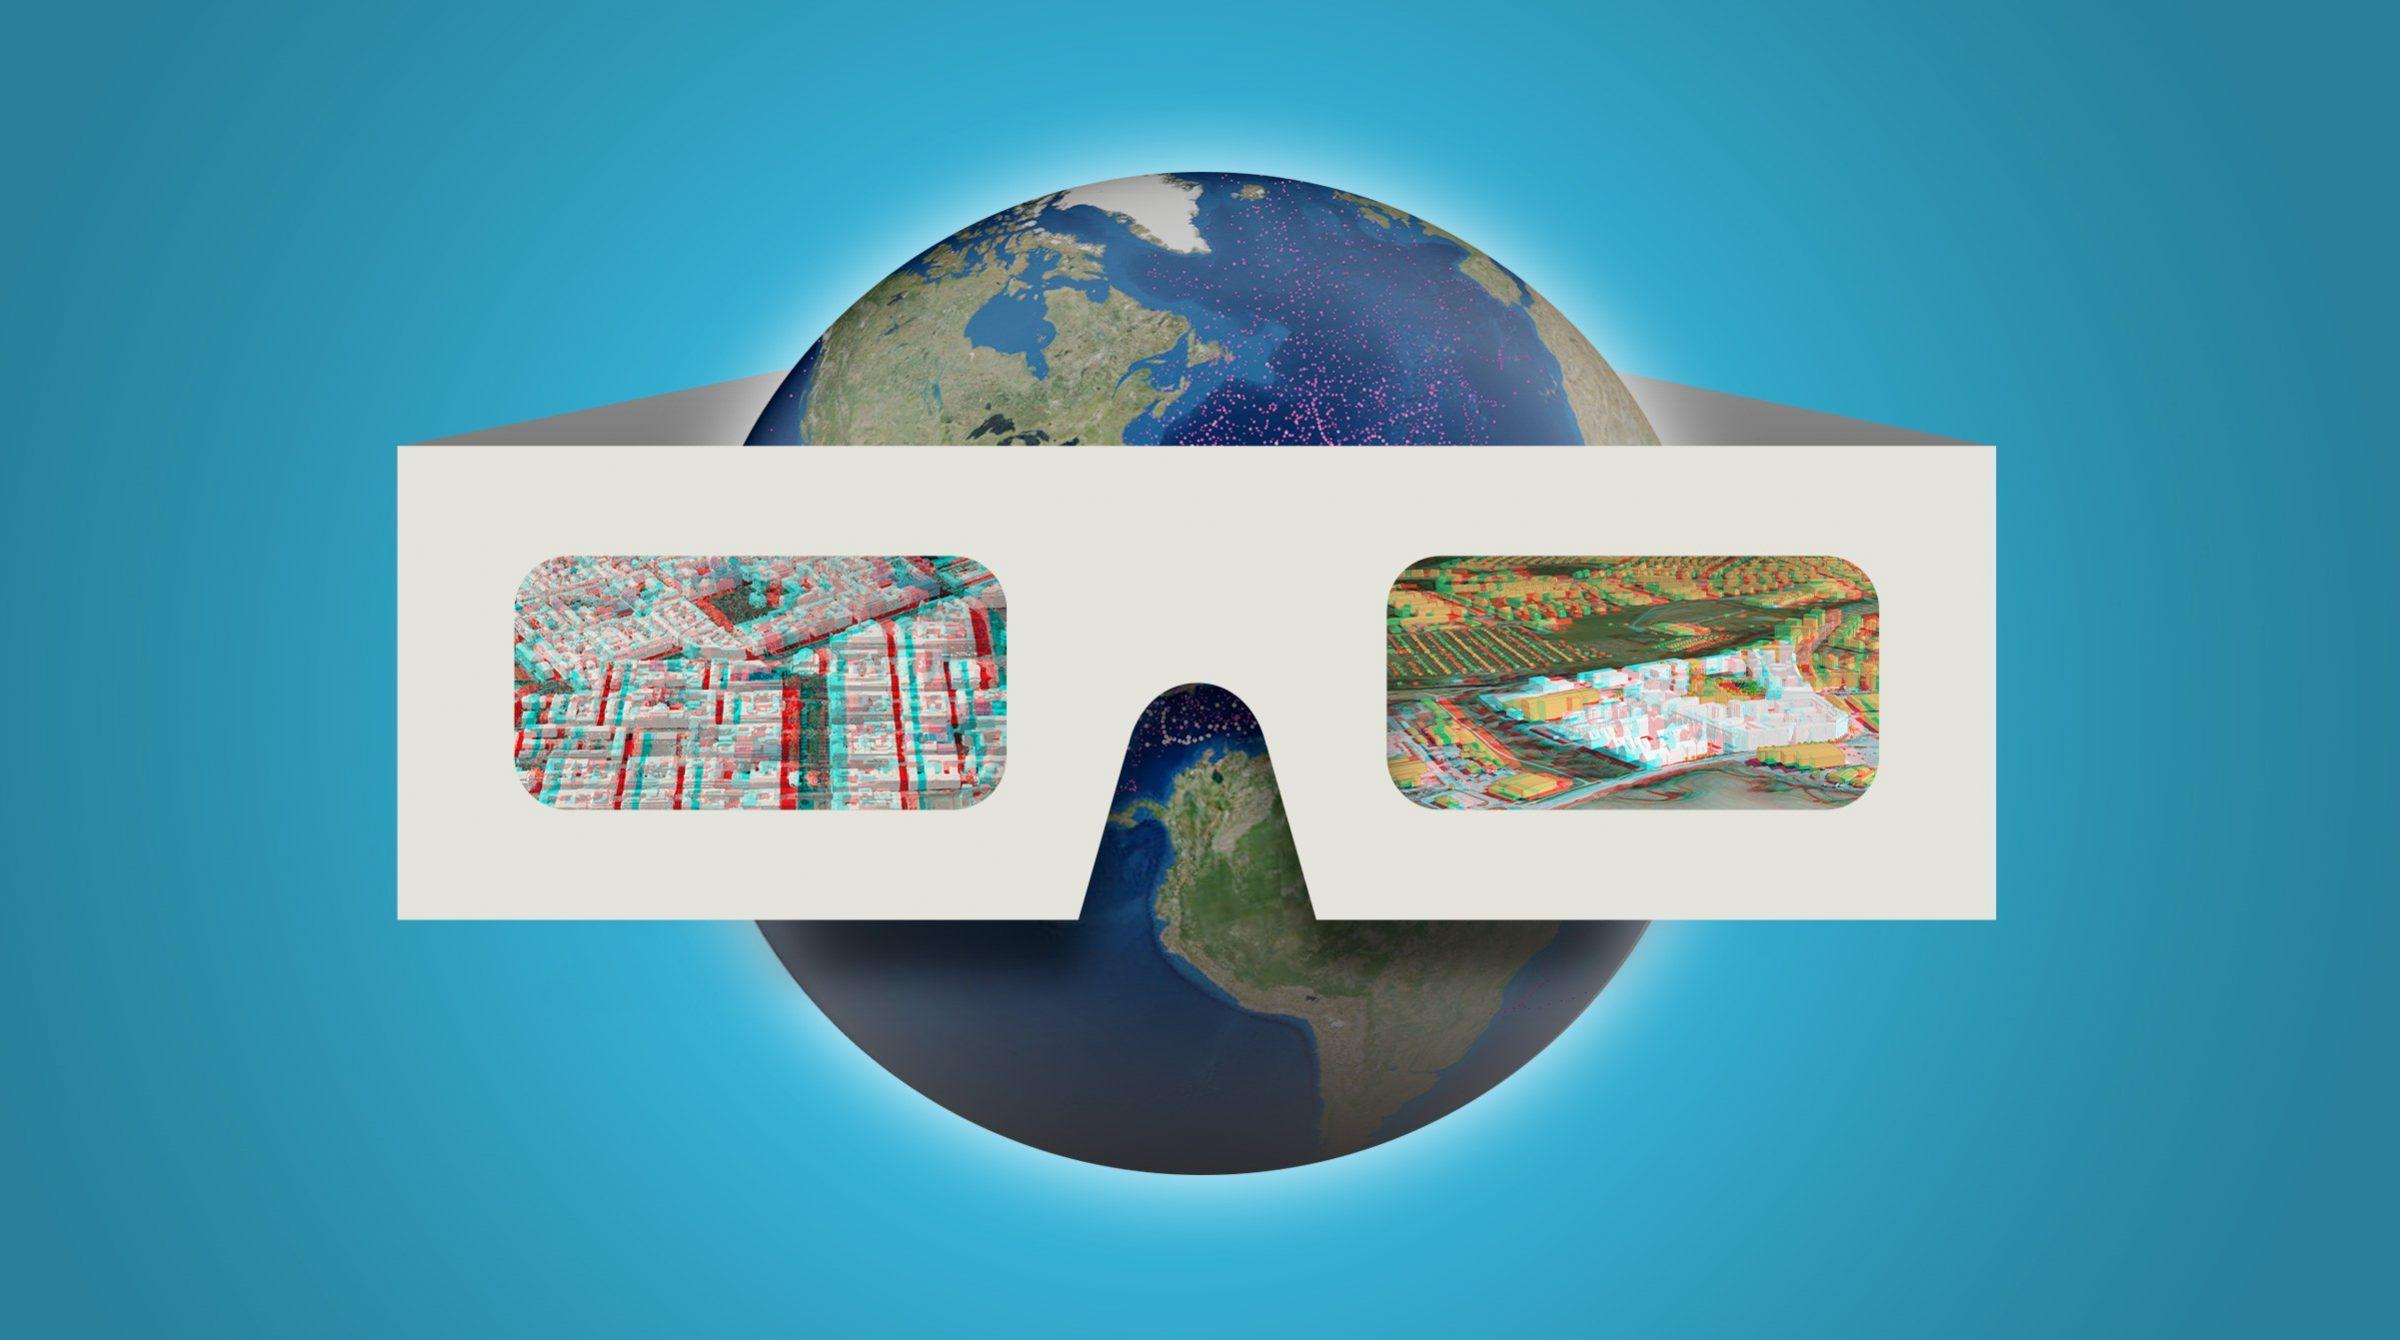 3D-glasögon på jordglob